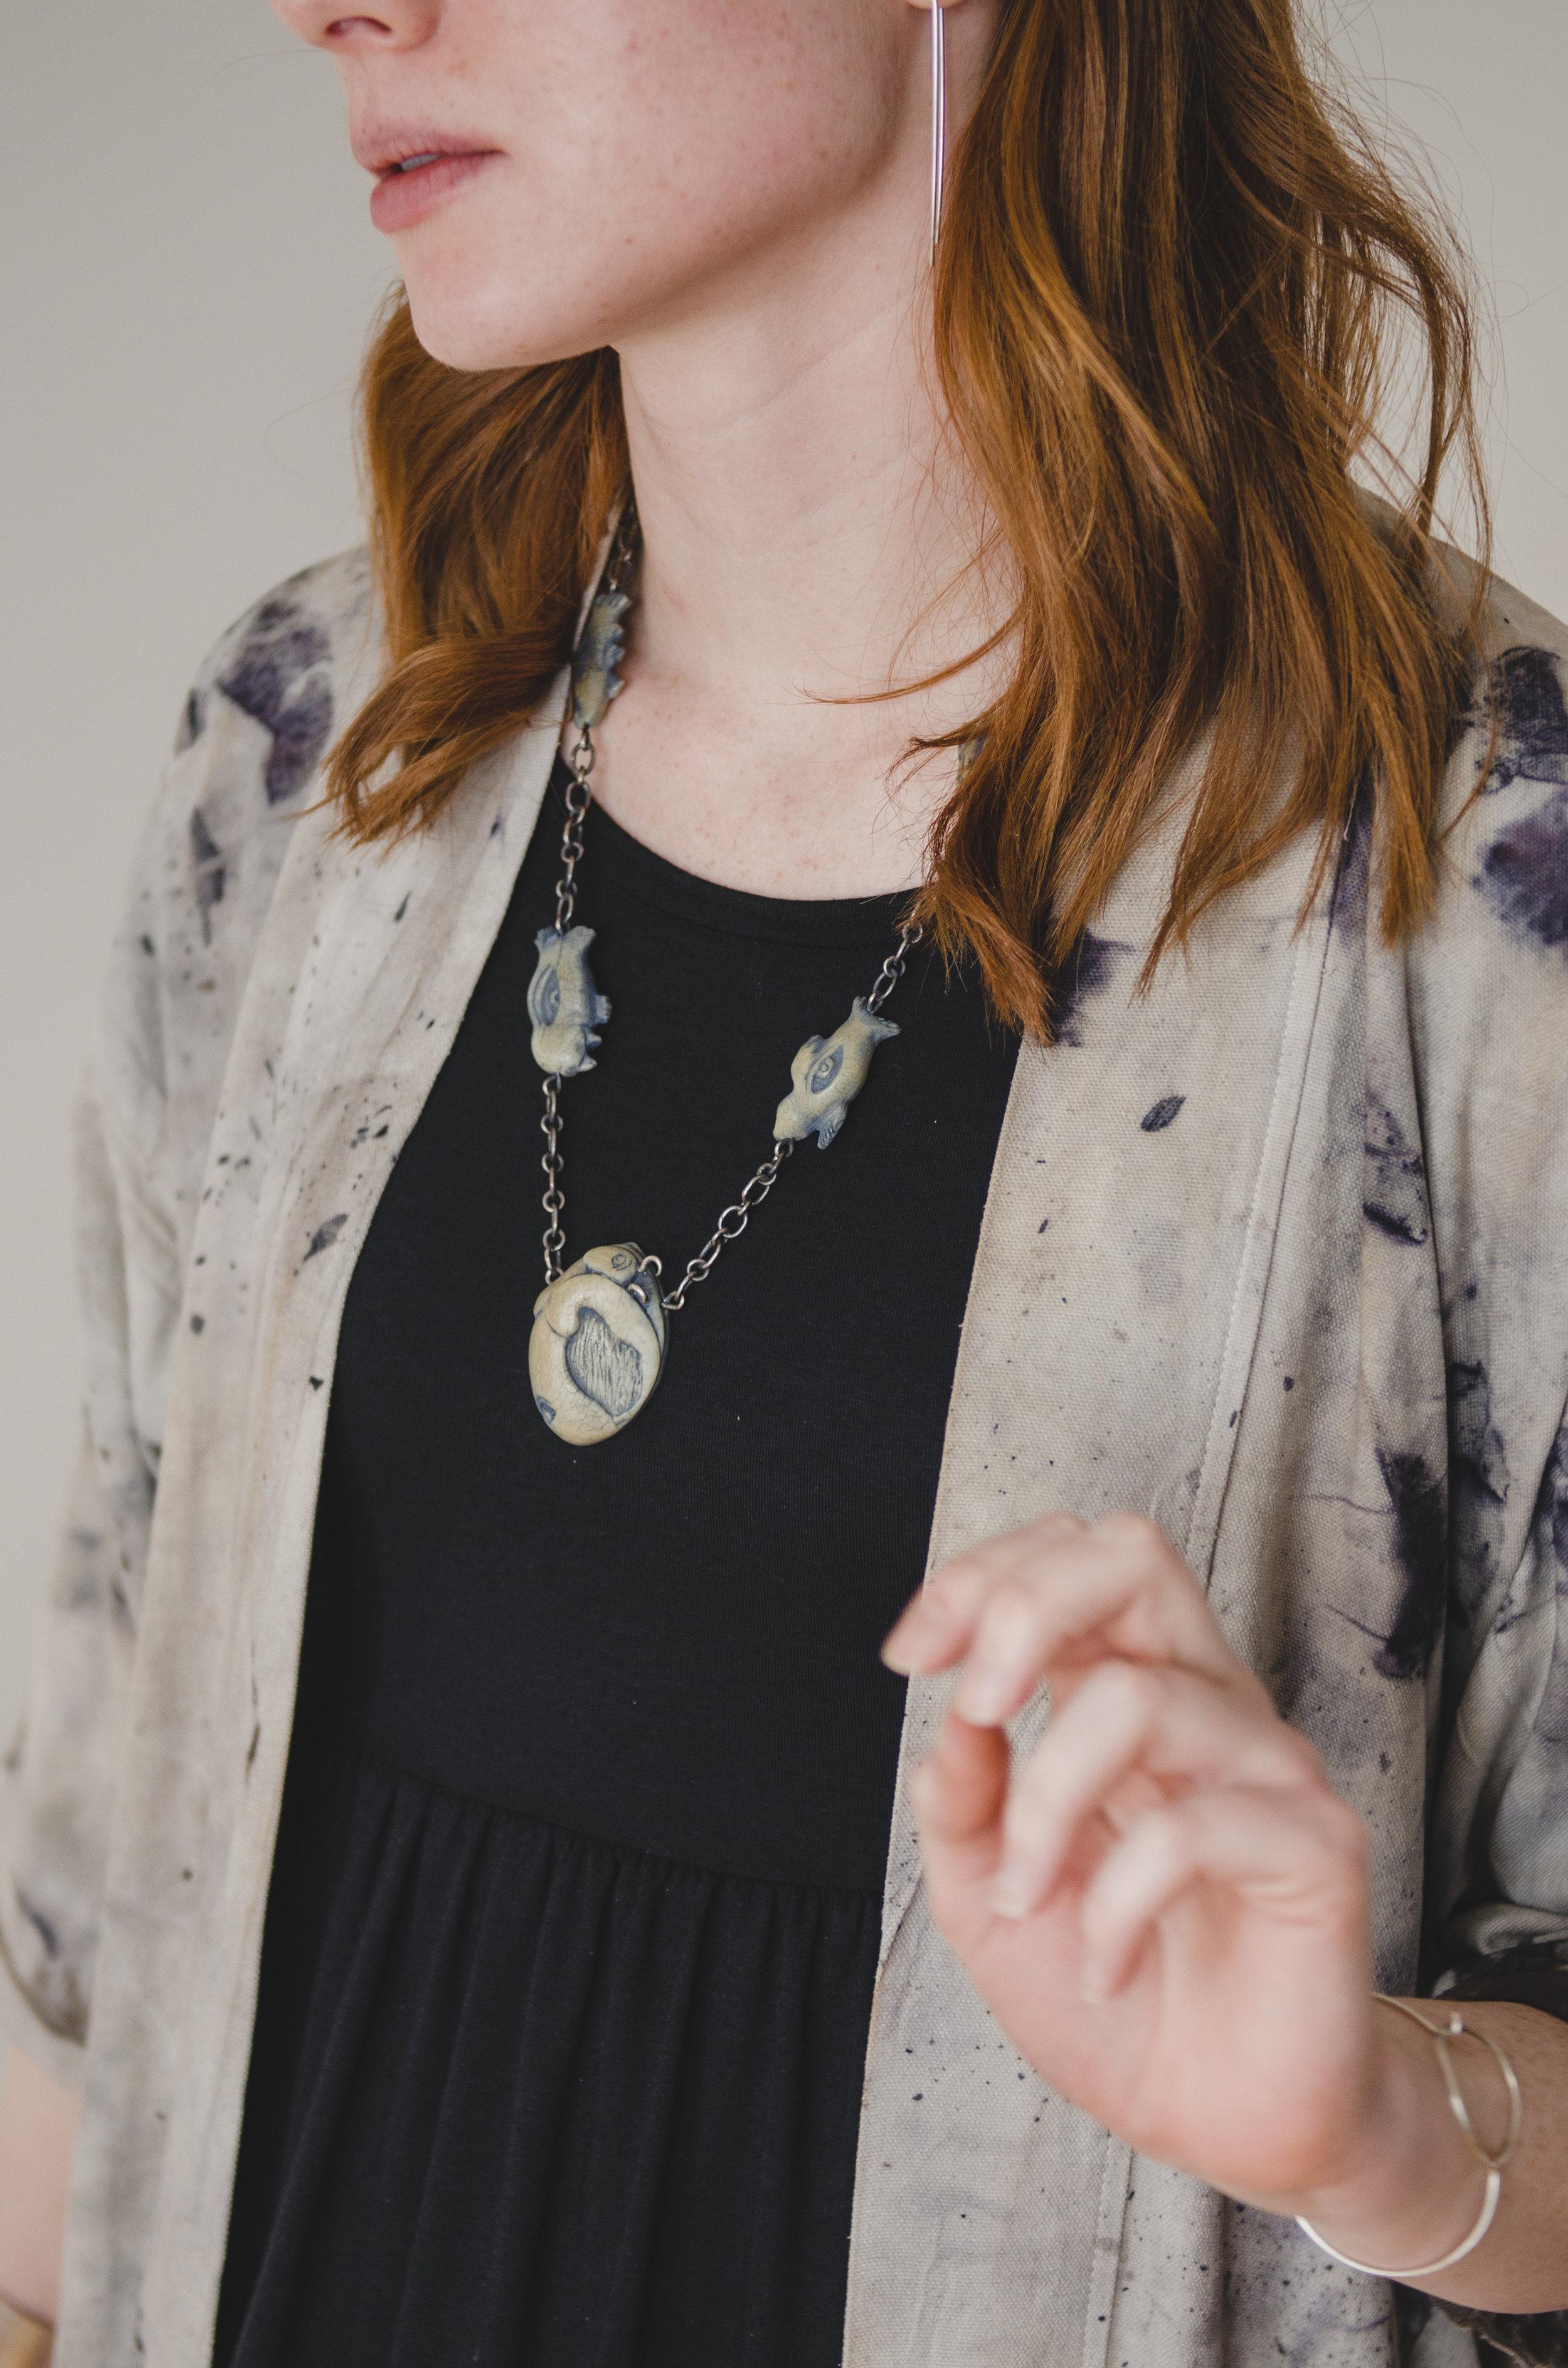 Ethical Ivory Necklace:  Shona Rae  Japanese-inspired Workwear Jacket: Irene Rasetti  Dress: Buttercream Clothing  Earrings & Bracelet: Kari Woo Tights: Riyoko  Photography:  Ally C Tran   Model:  Alexis Rose